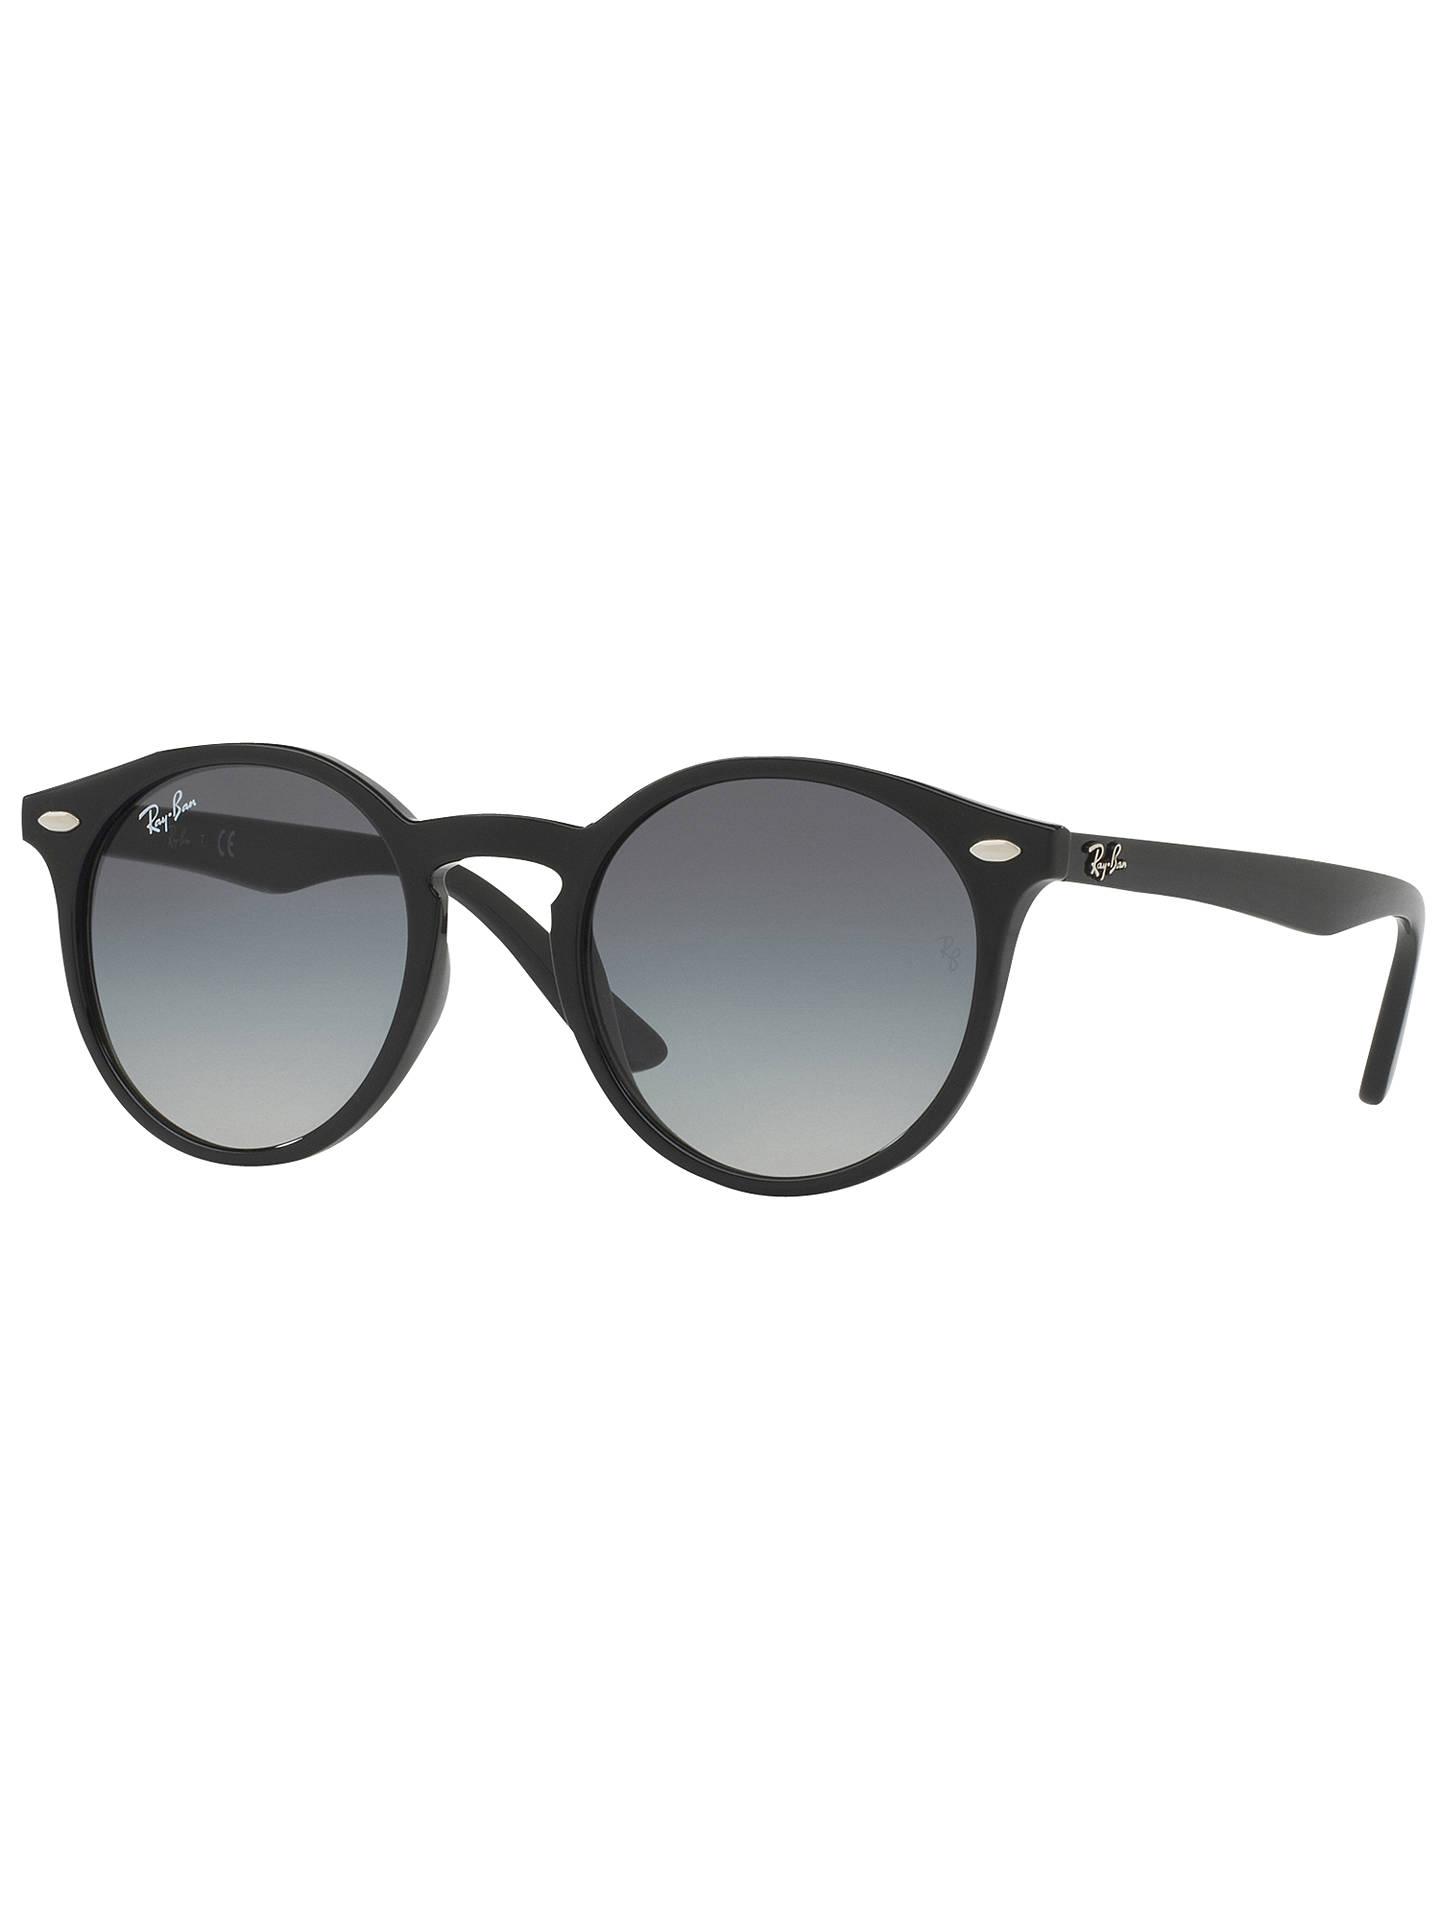 1e36130901 Ray-Ban Junior RJ9064S Round Sunglasses at John Lewis   Partners